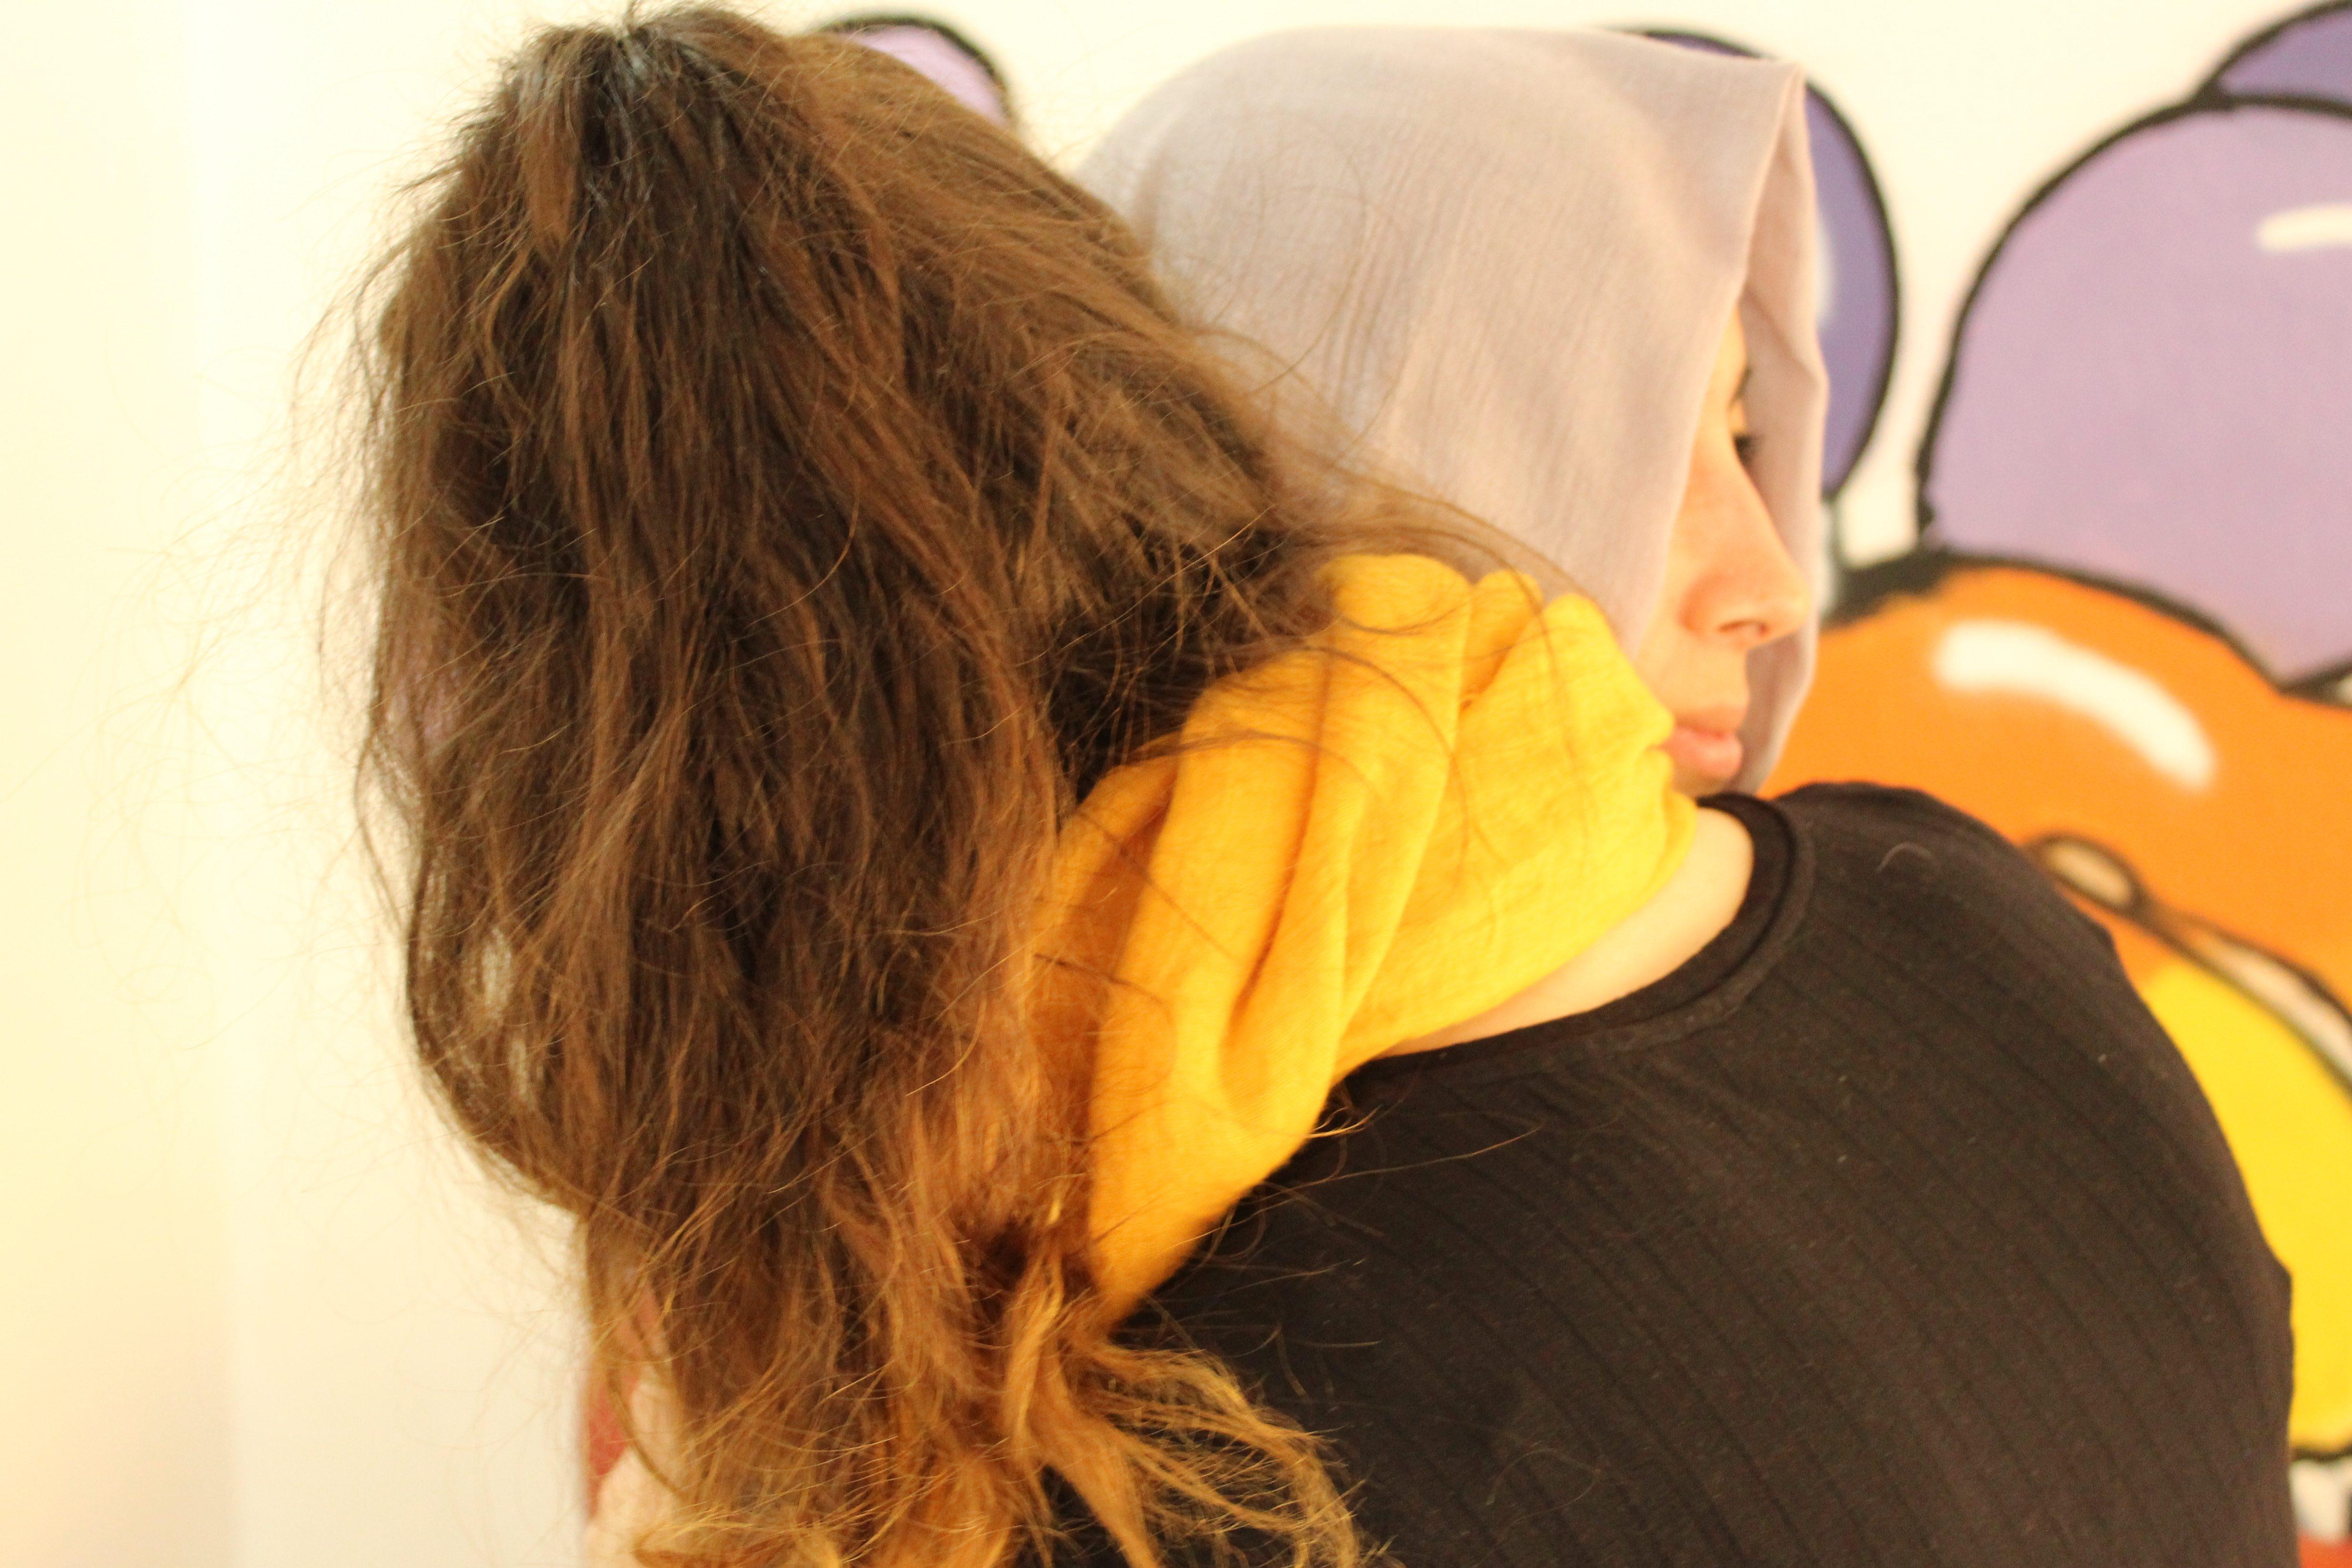 Umarmung zweier Frauen